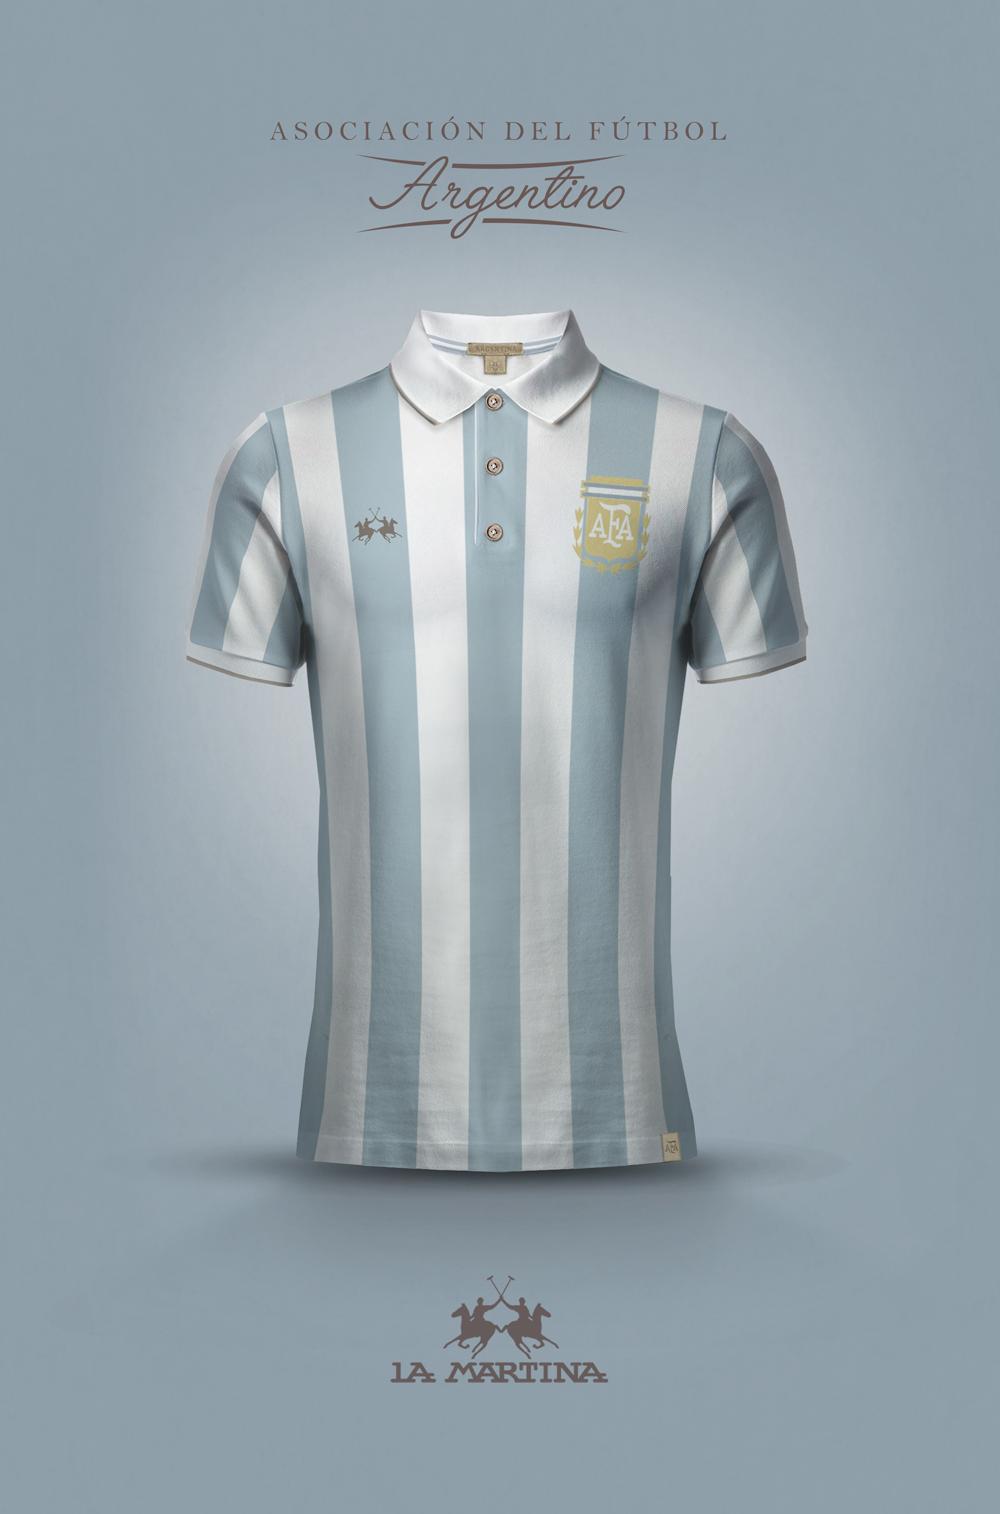 Adidas Original x Retro International Football Shirts